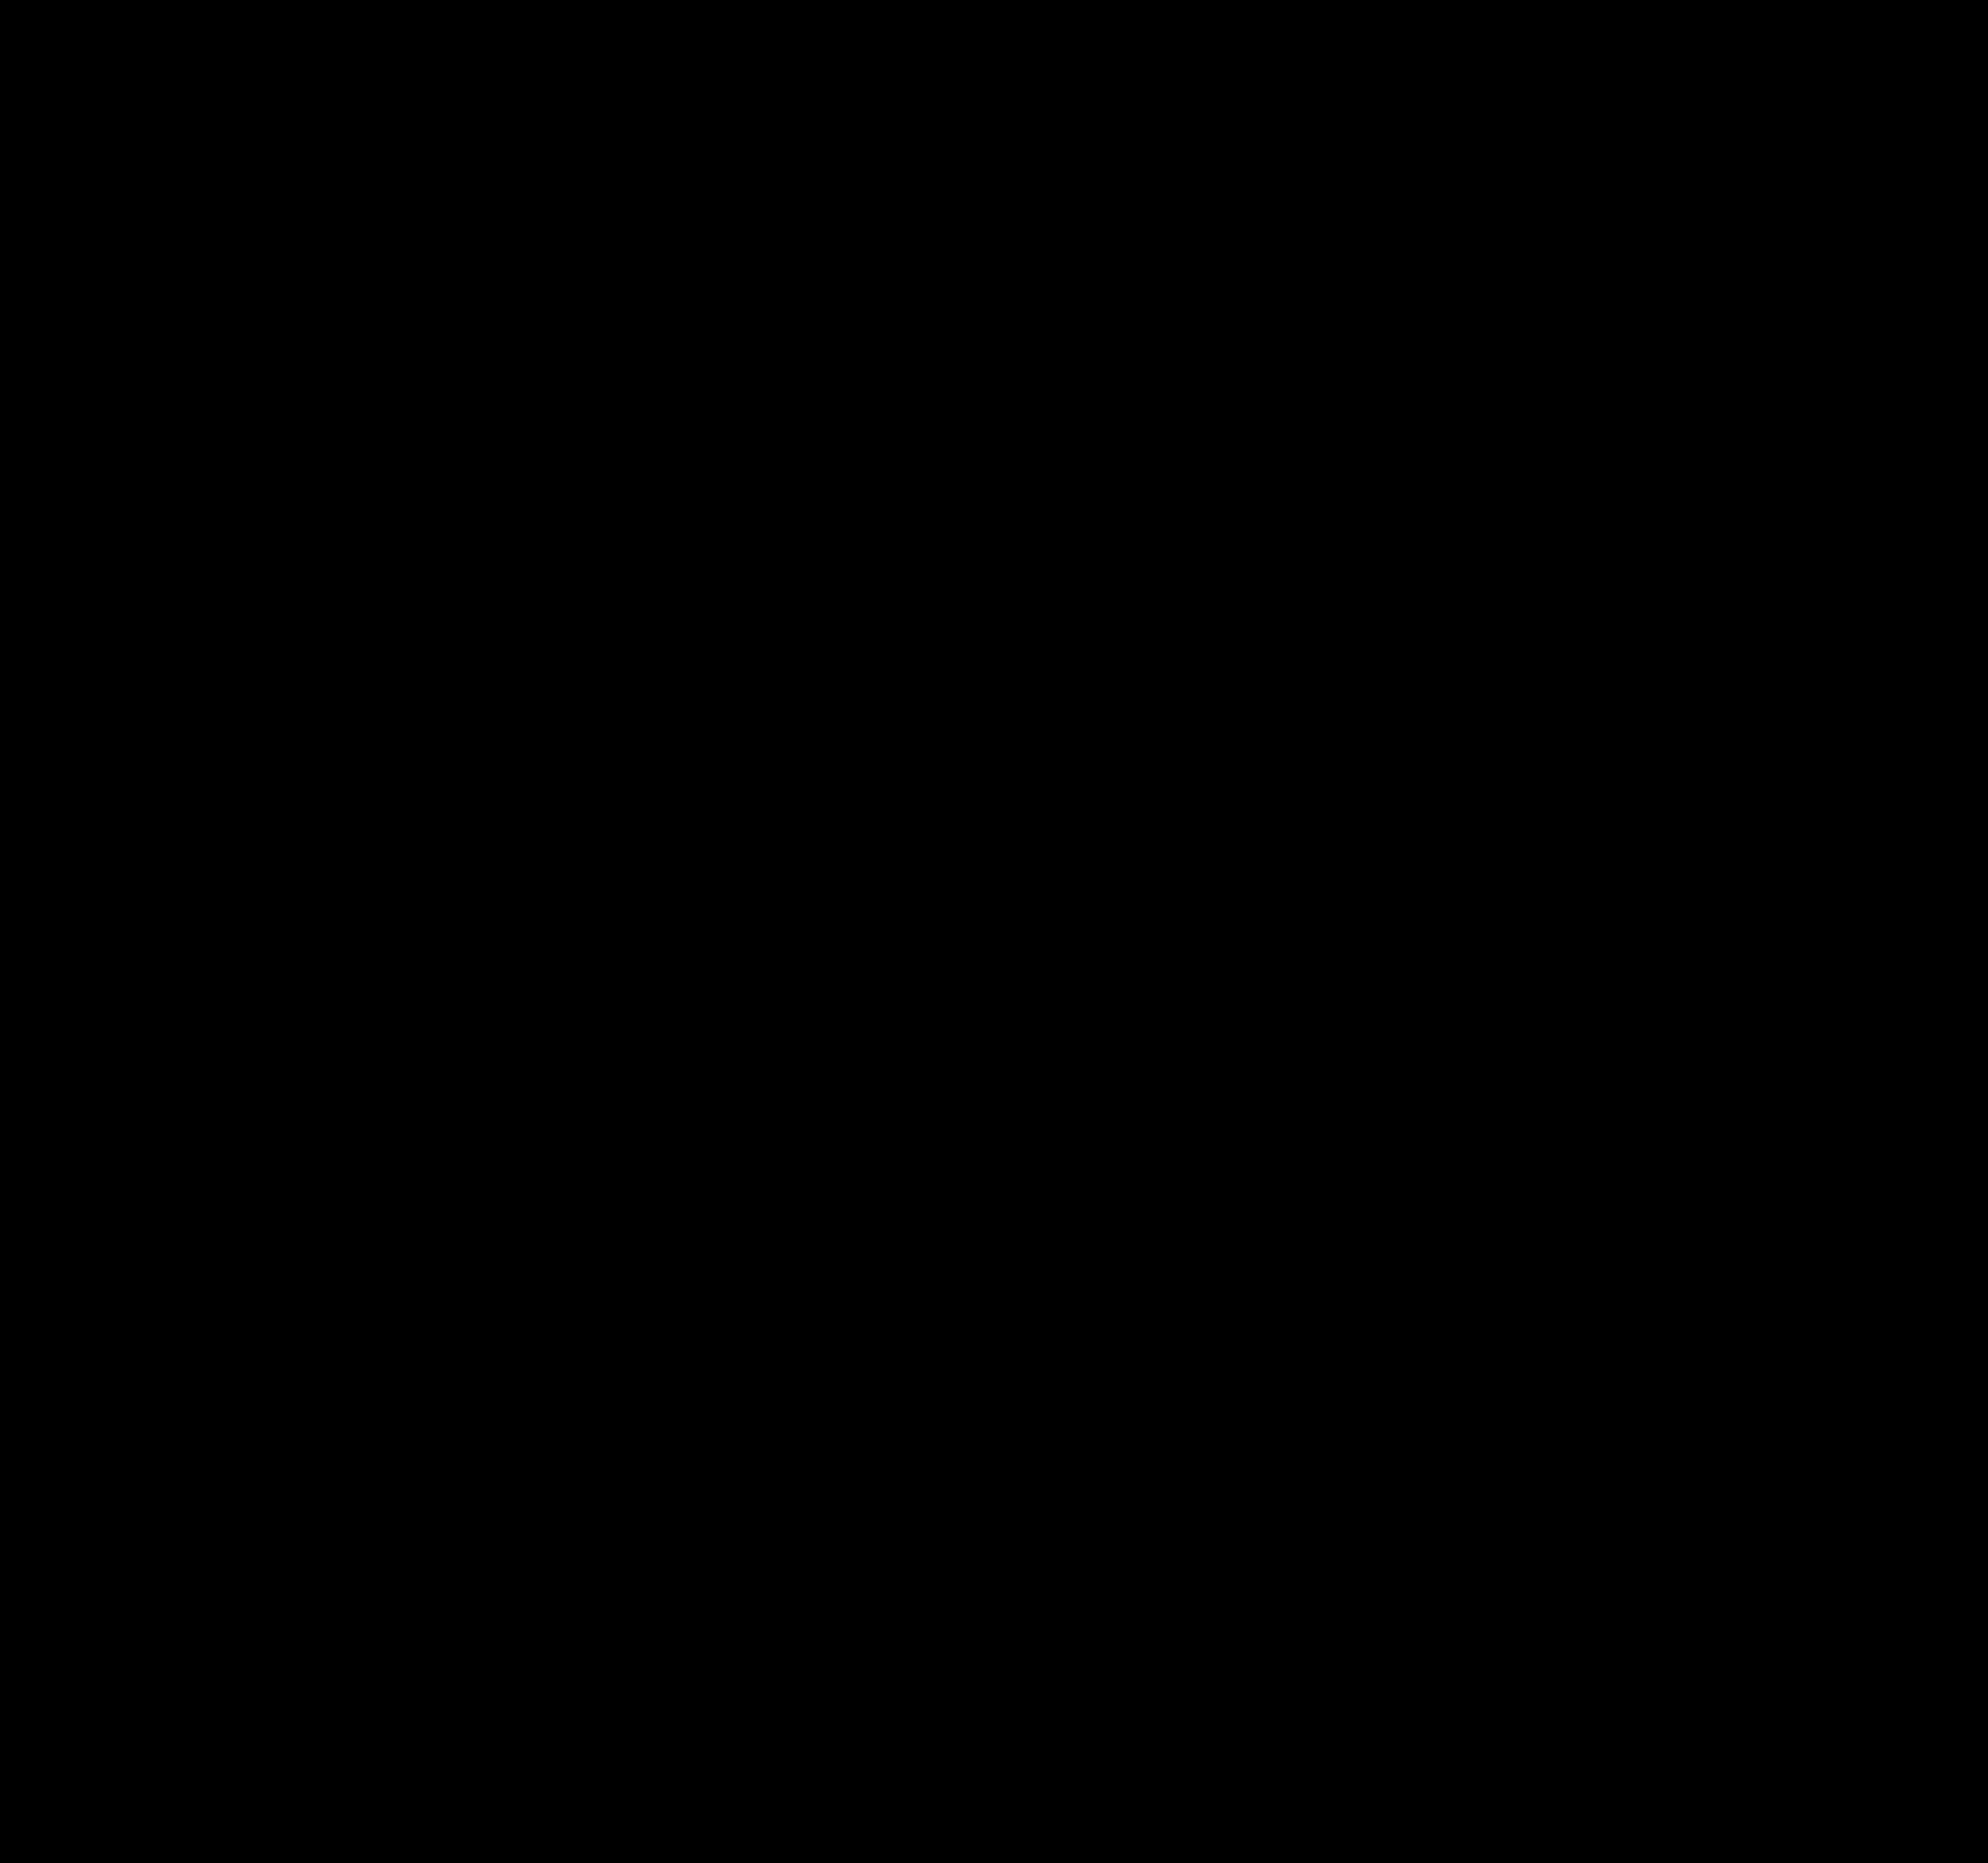 Line Art Png : Clipart diamond line illustration